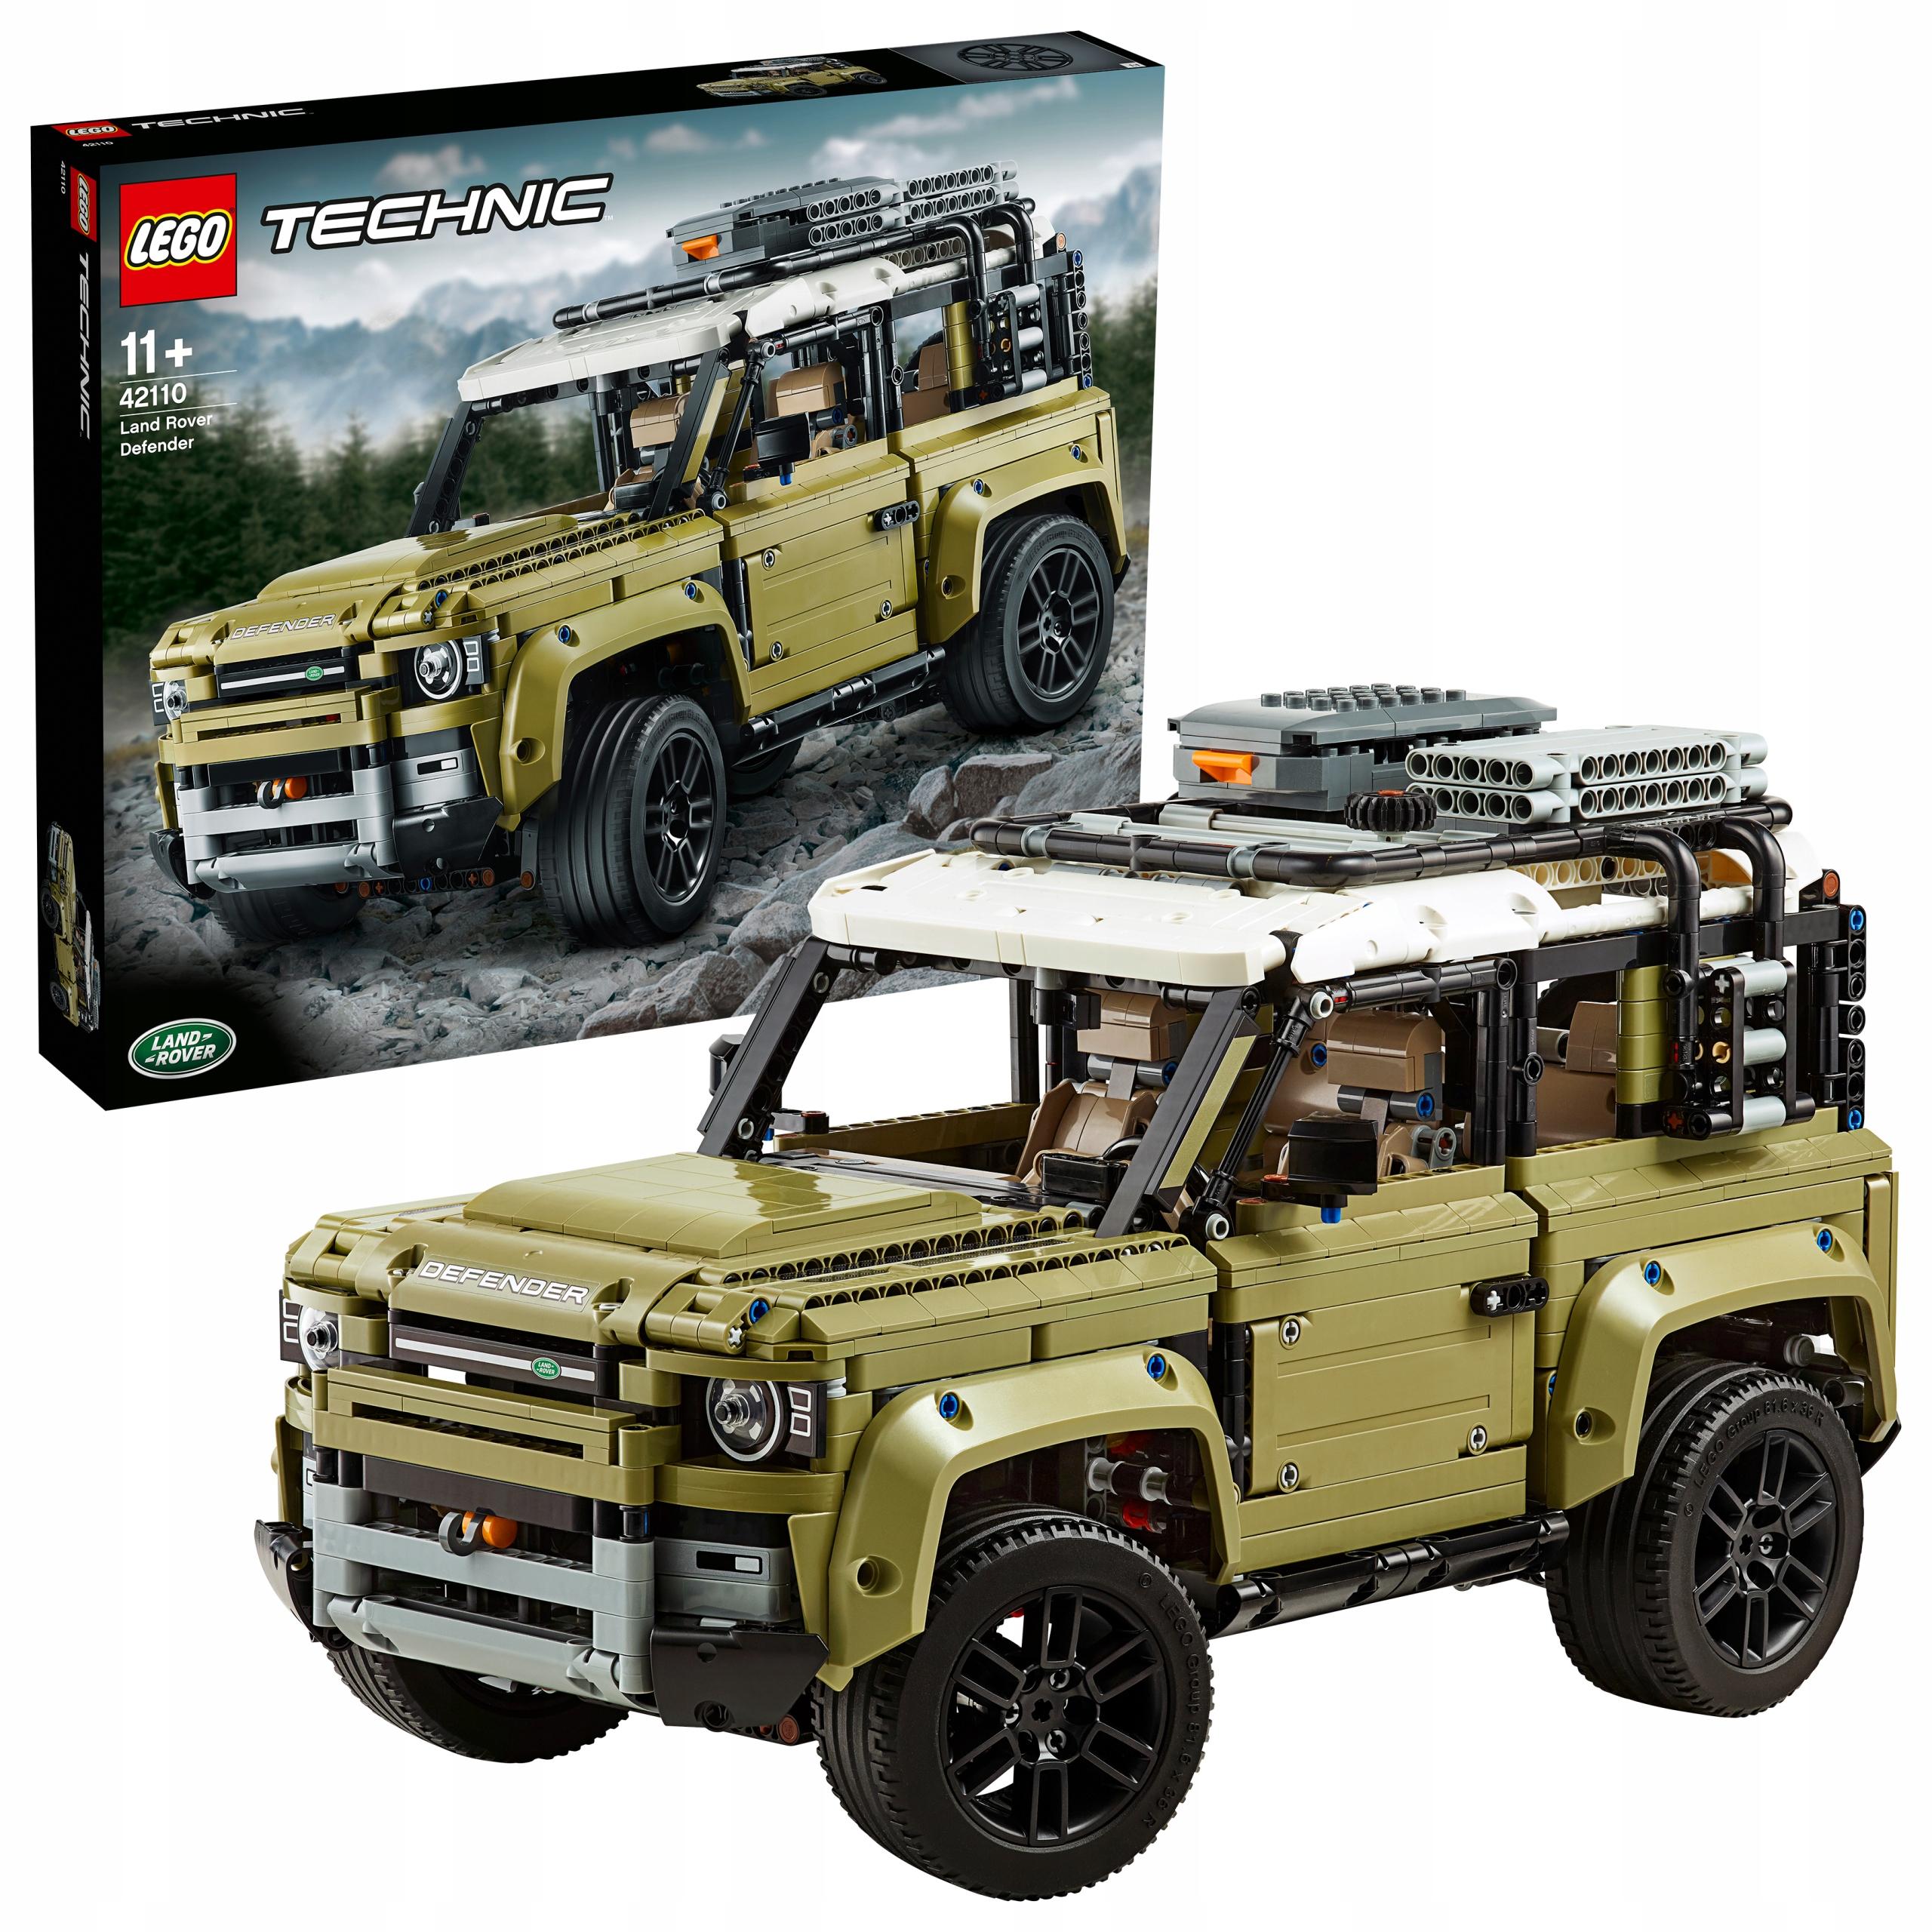 Klocki Lego Technic Land Rover Defender 42110